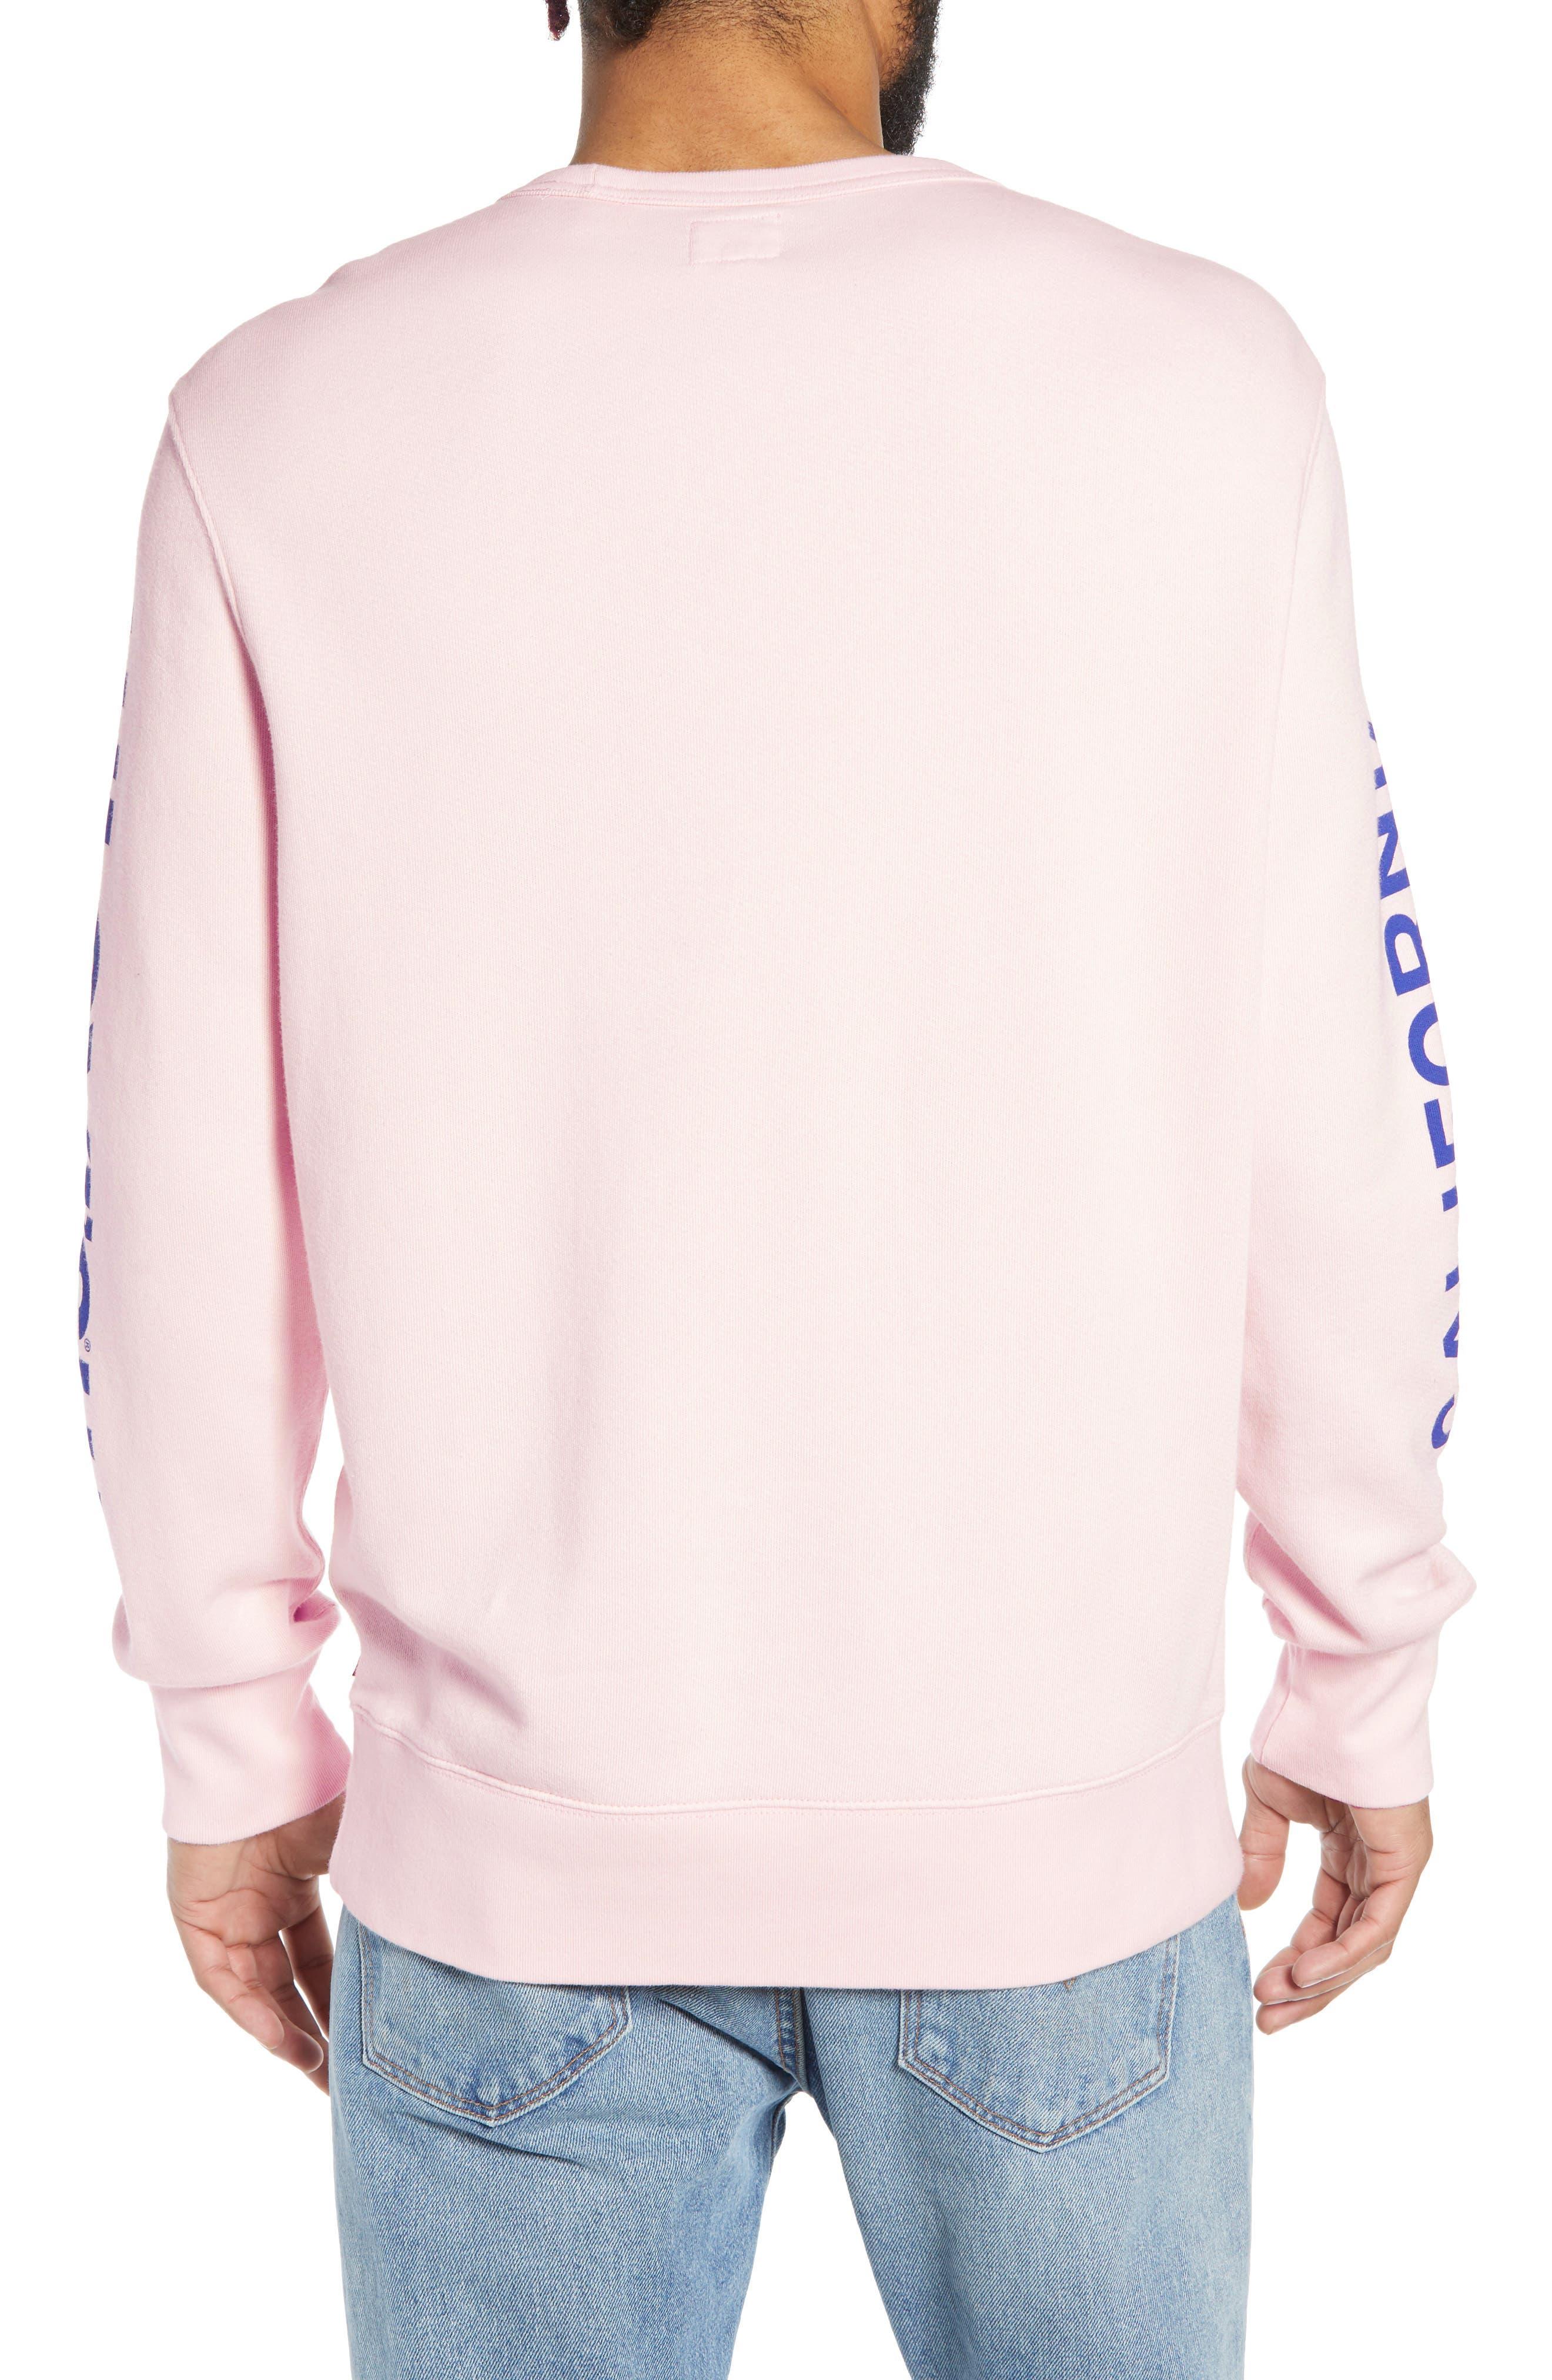 LEVI'S<SUP>®</SUP>, Logo Graphic Longline Crewneck Sweatshirt, Alternate thumbnail 2, color, BALLERINA